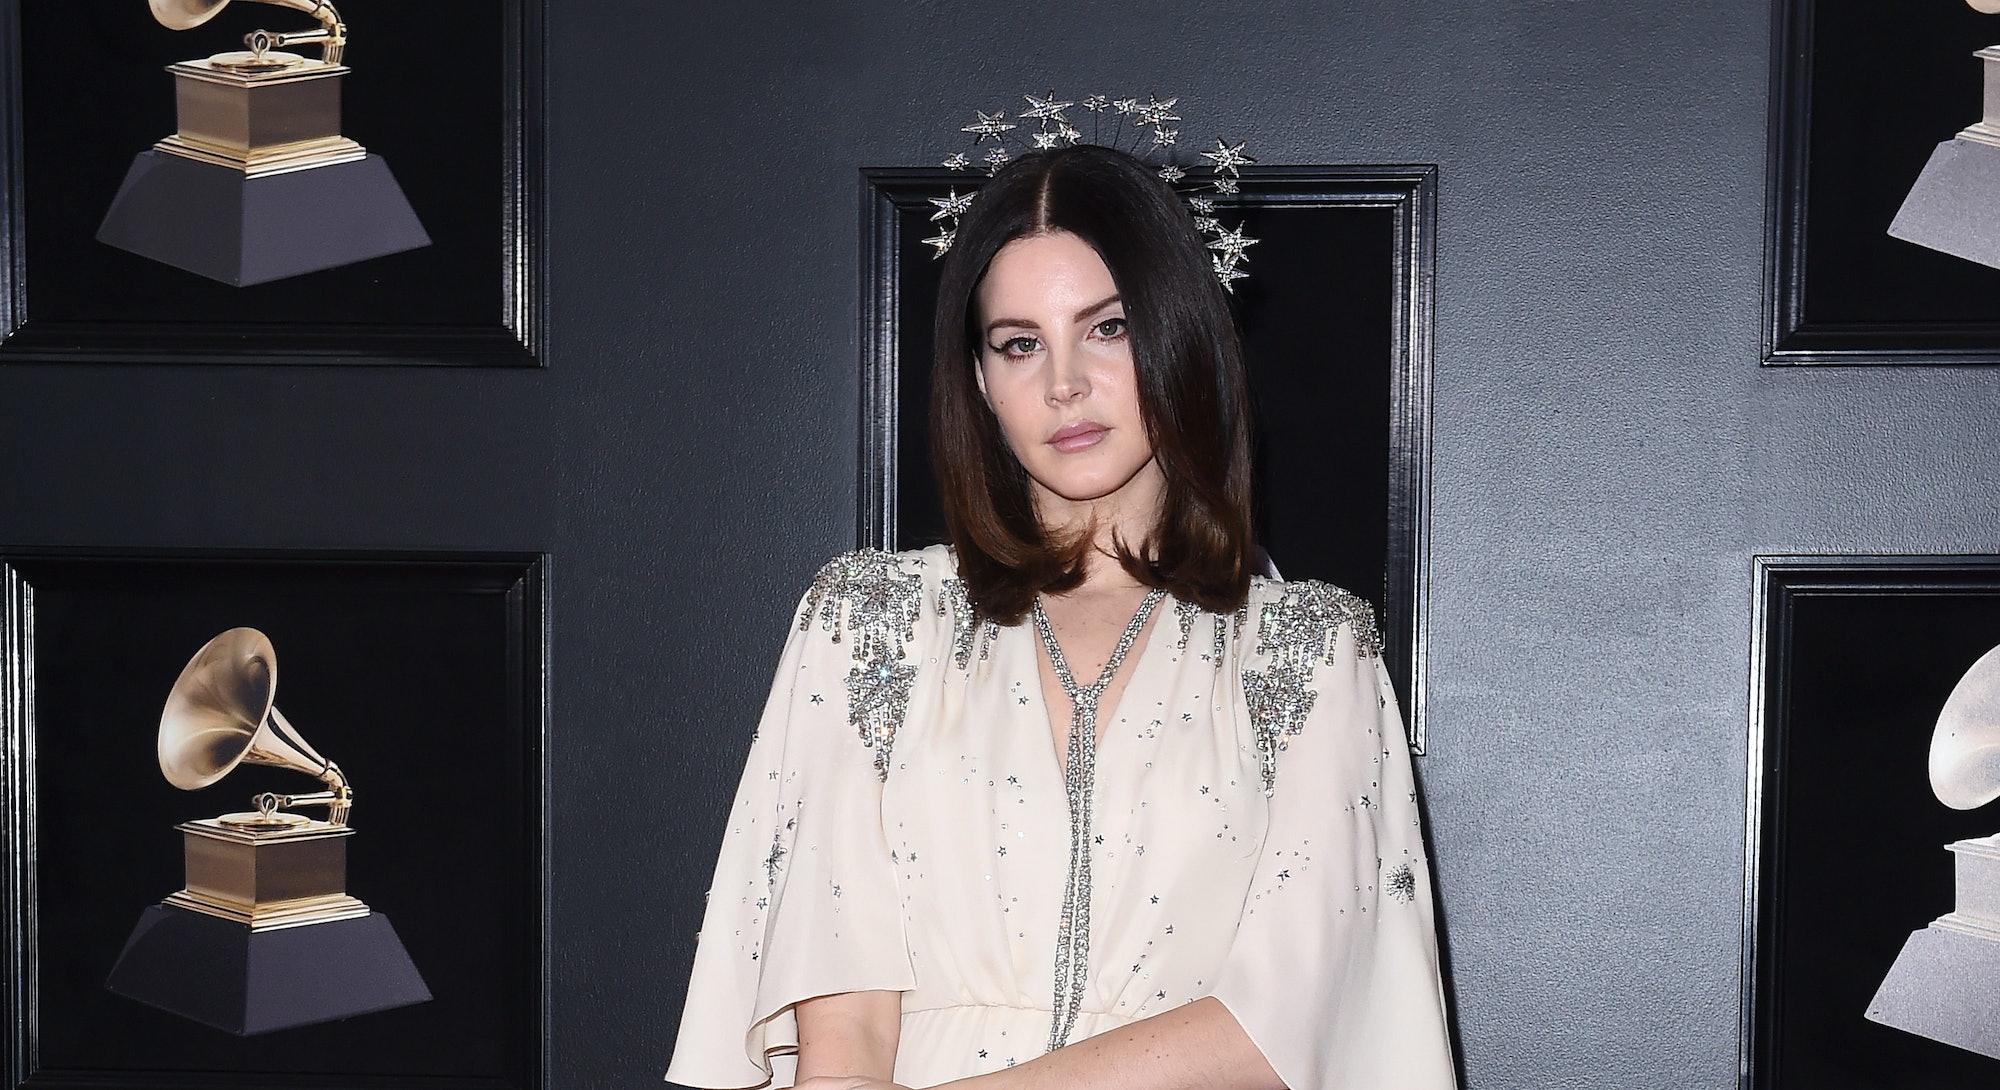 Lana Del Rey at the 2018 Grammys.